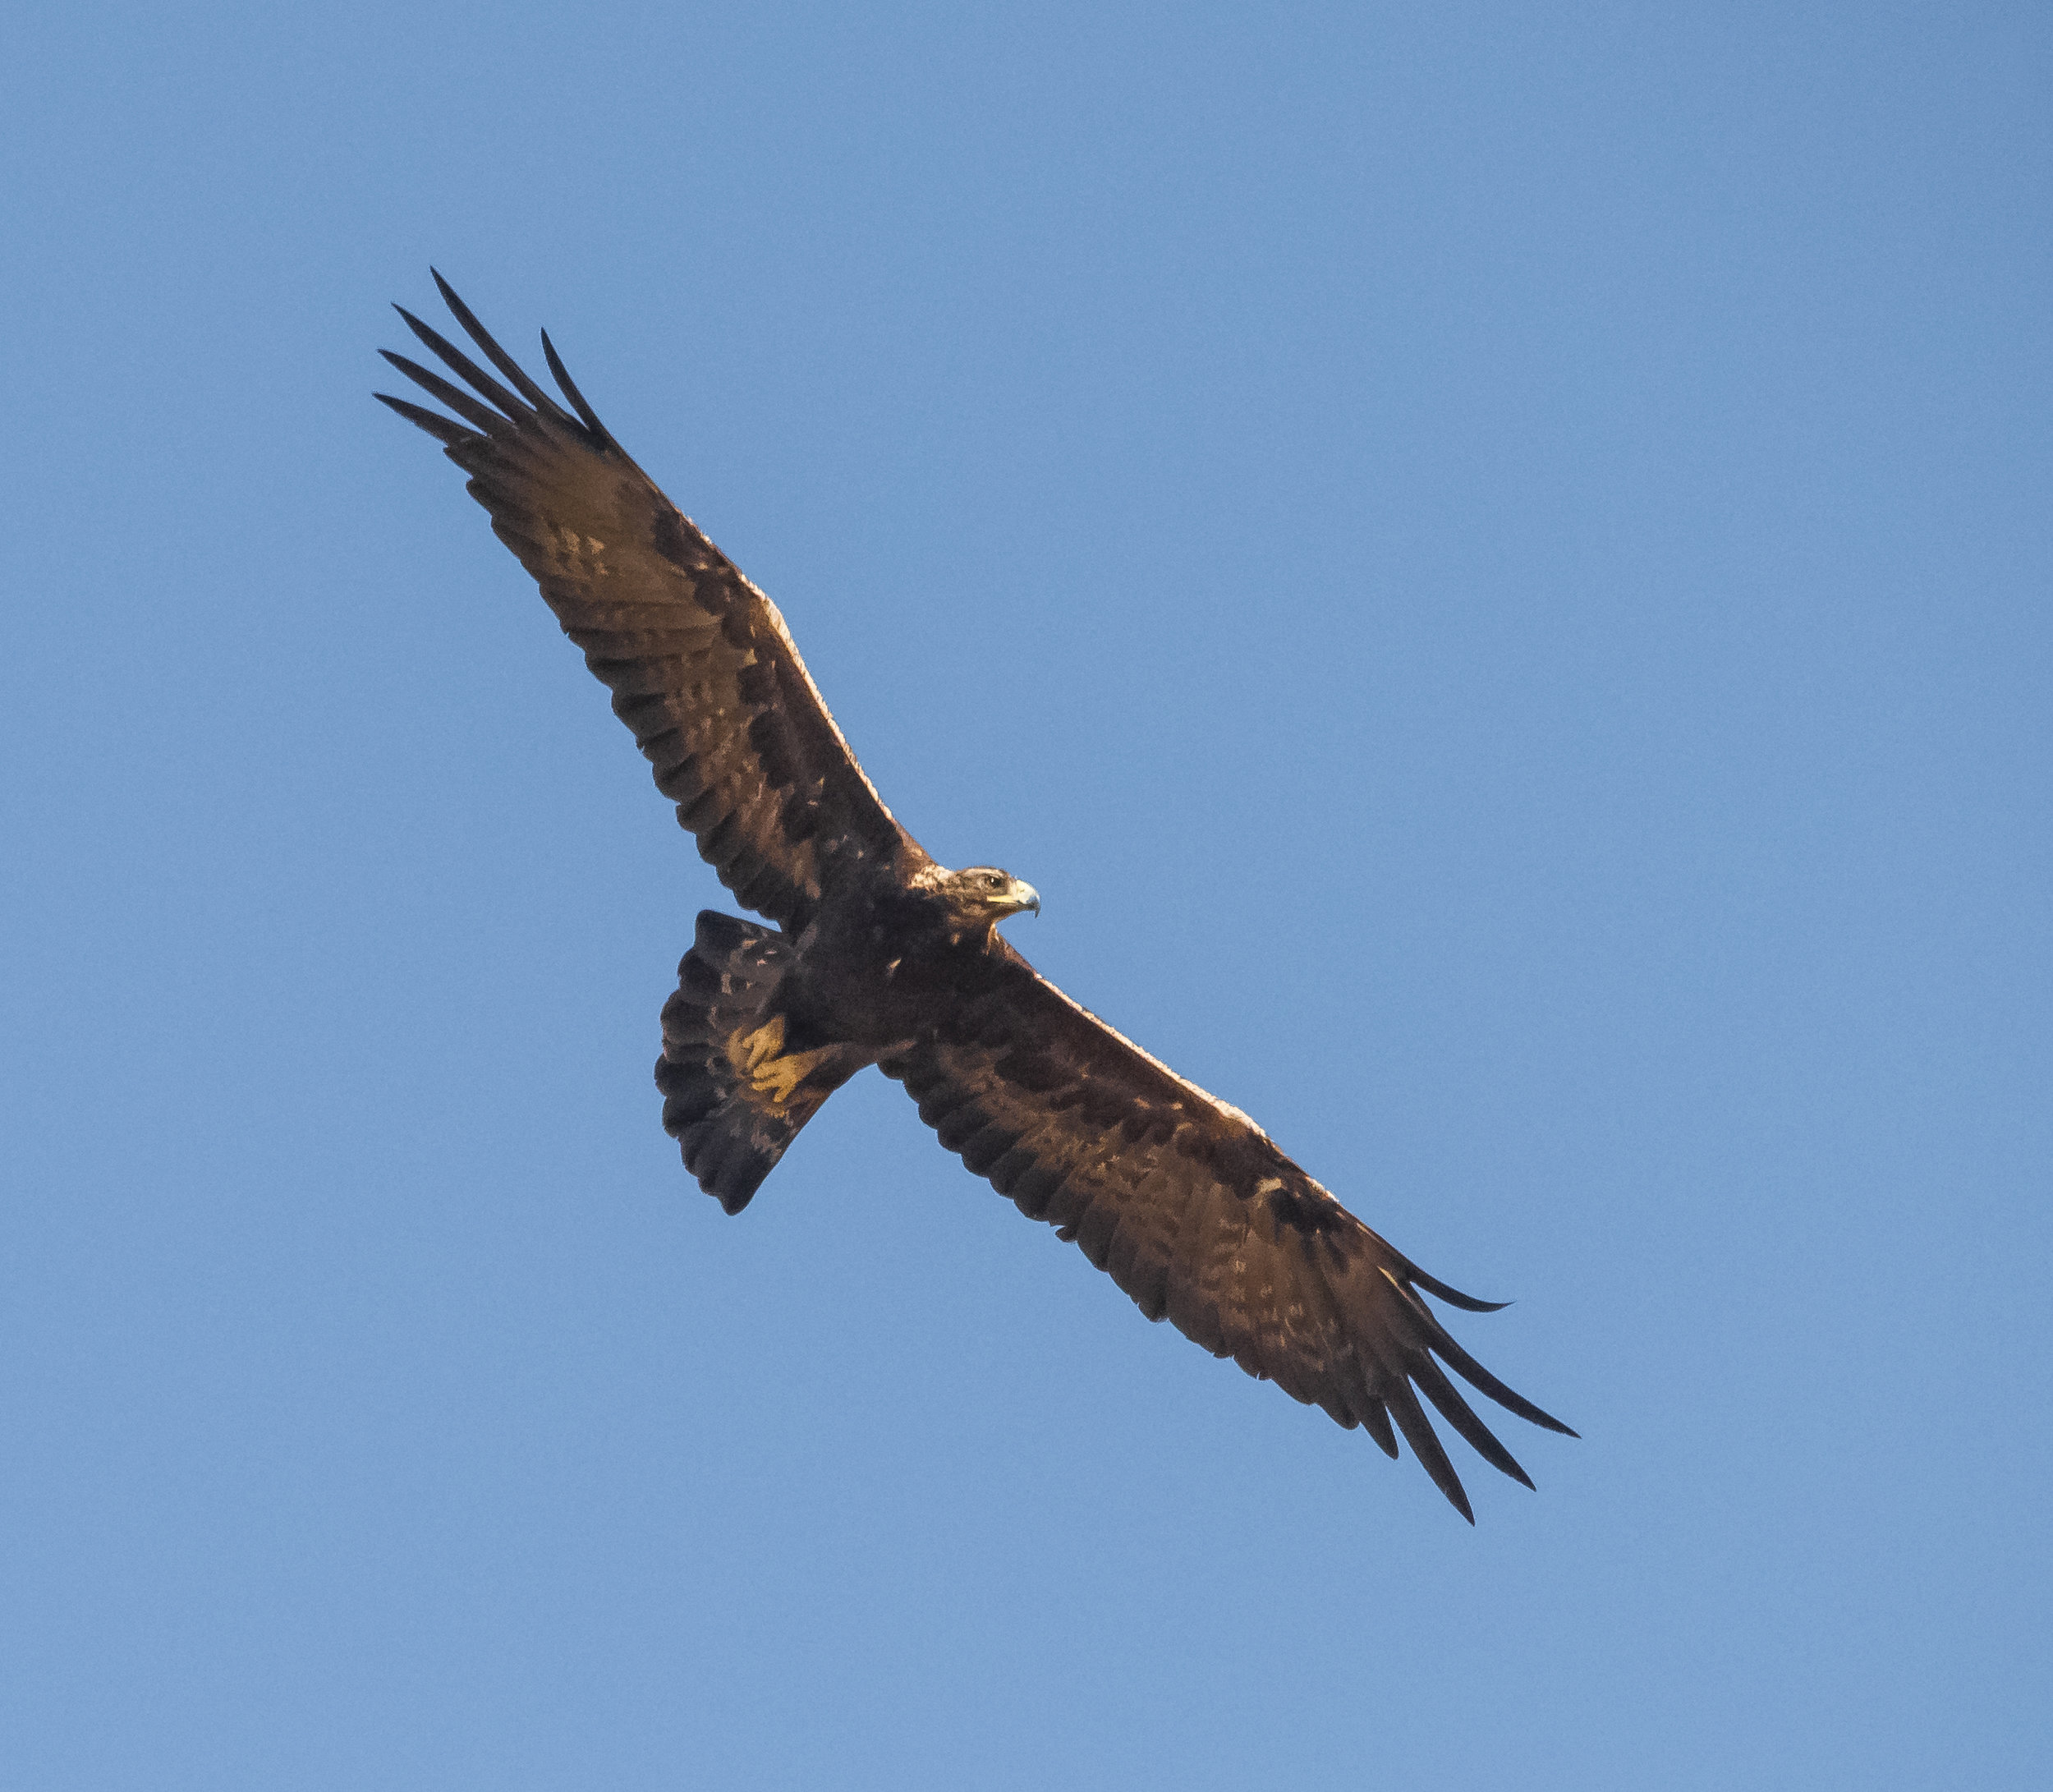 Golden Eagle at Coyote Valley Open Space Preserve, Morgan Hill, California